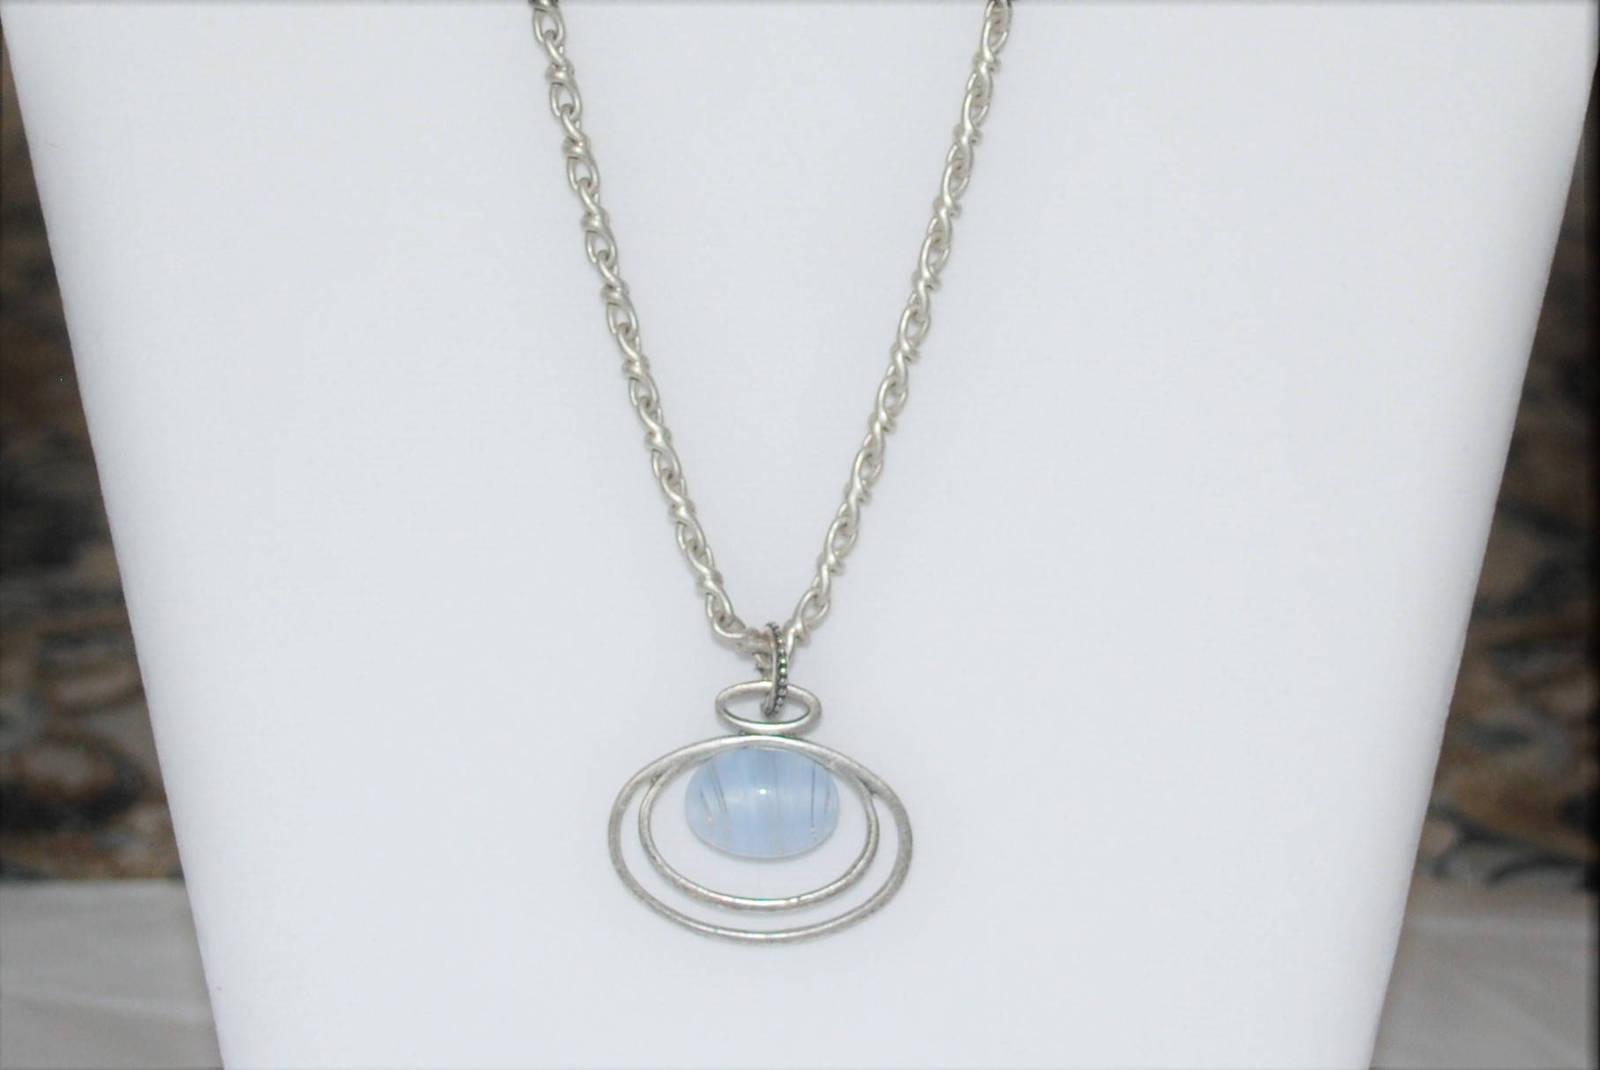 Blue Glass Quartz Floating Silver Pendant